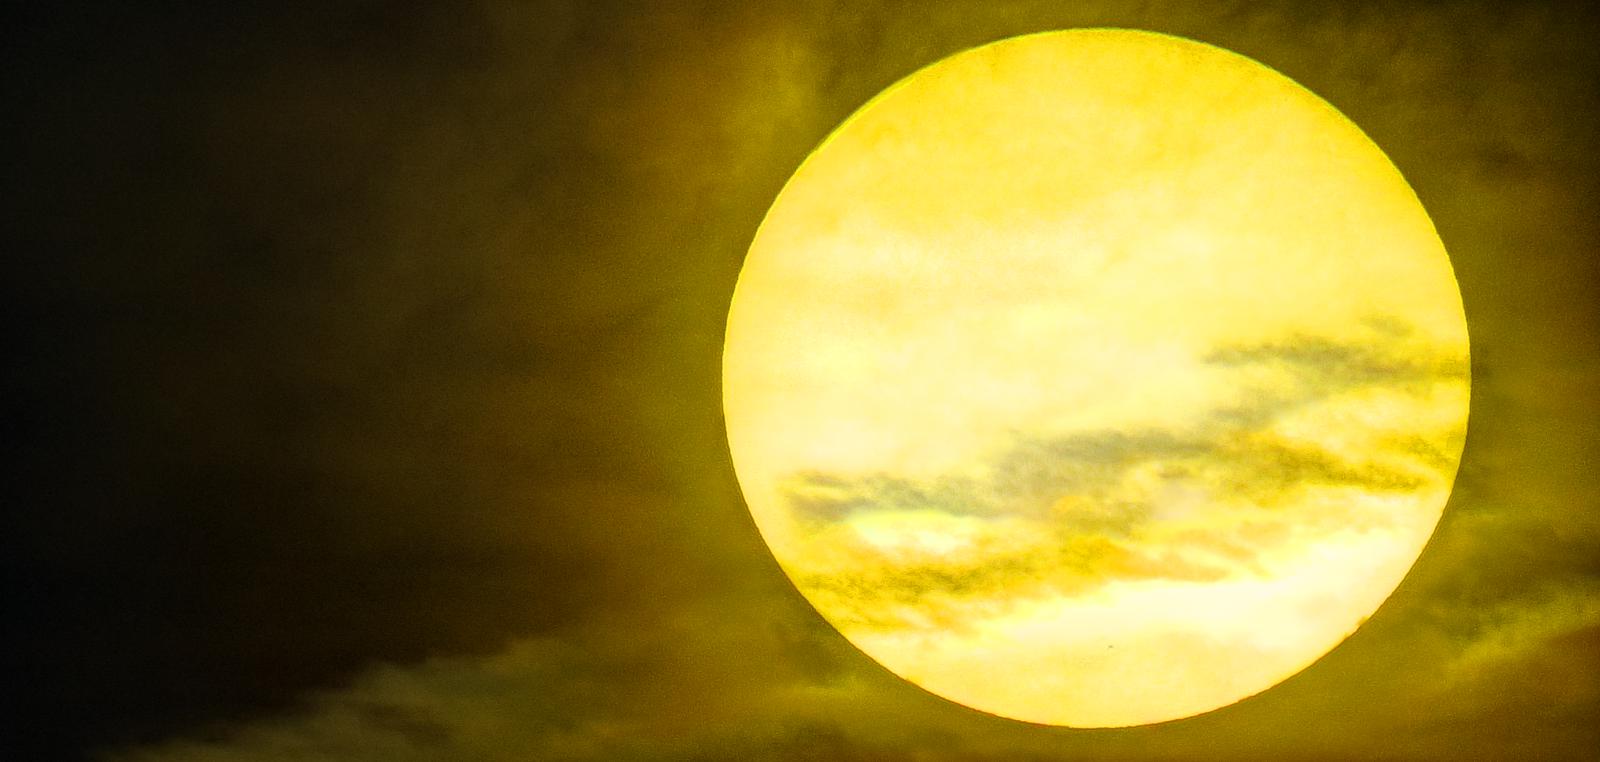 Sun HDR by L-Spiro